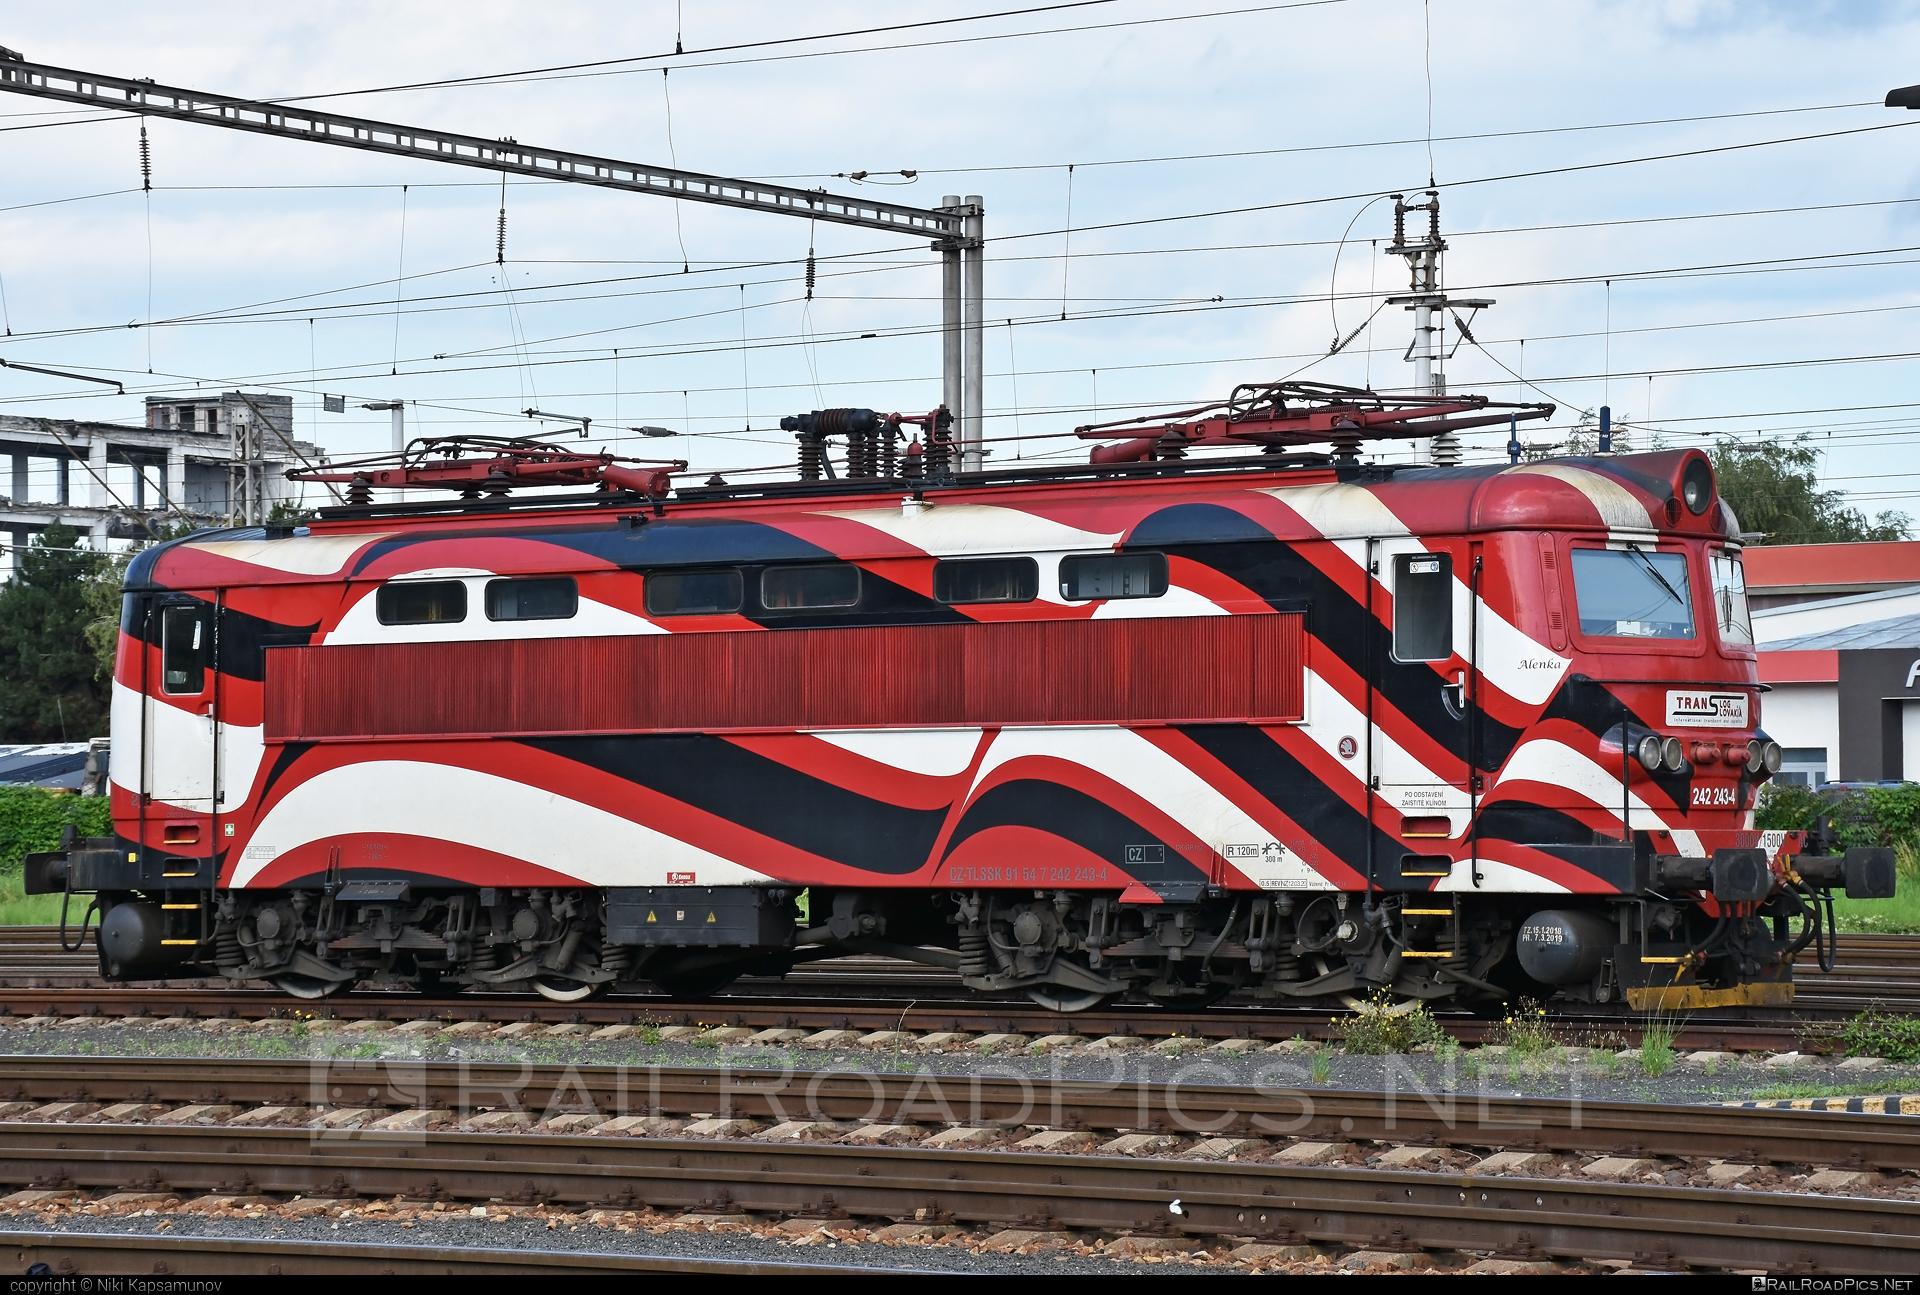 Škoda 73E - 242 243-4 operated by PETROLSPED Slovakia s.r.o. #locomotive242 #plechac #skoda #skoda73e #tlssk #translog #translogslovakia